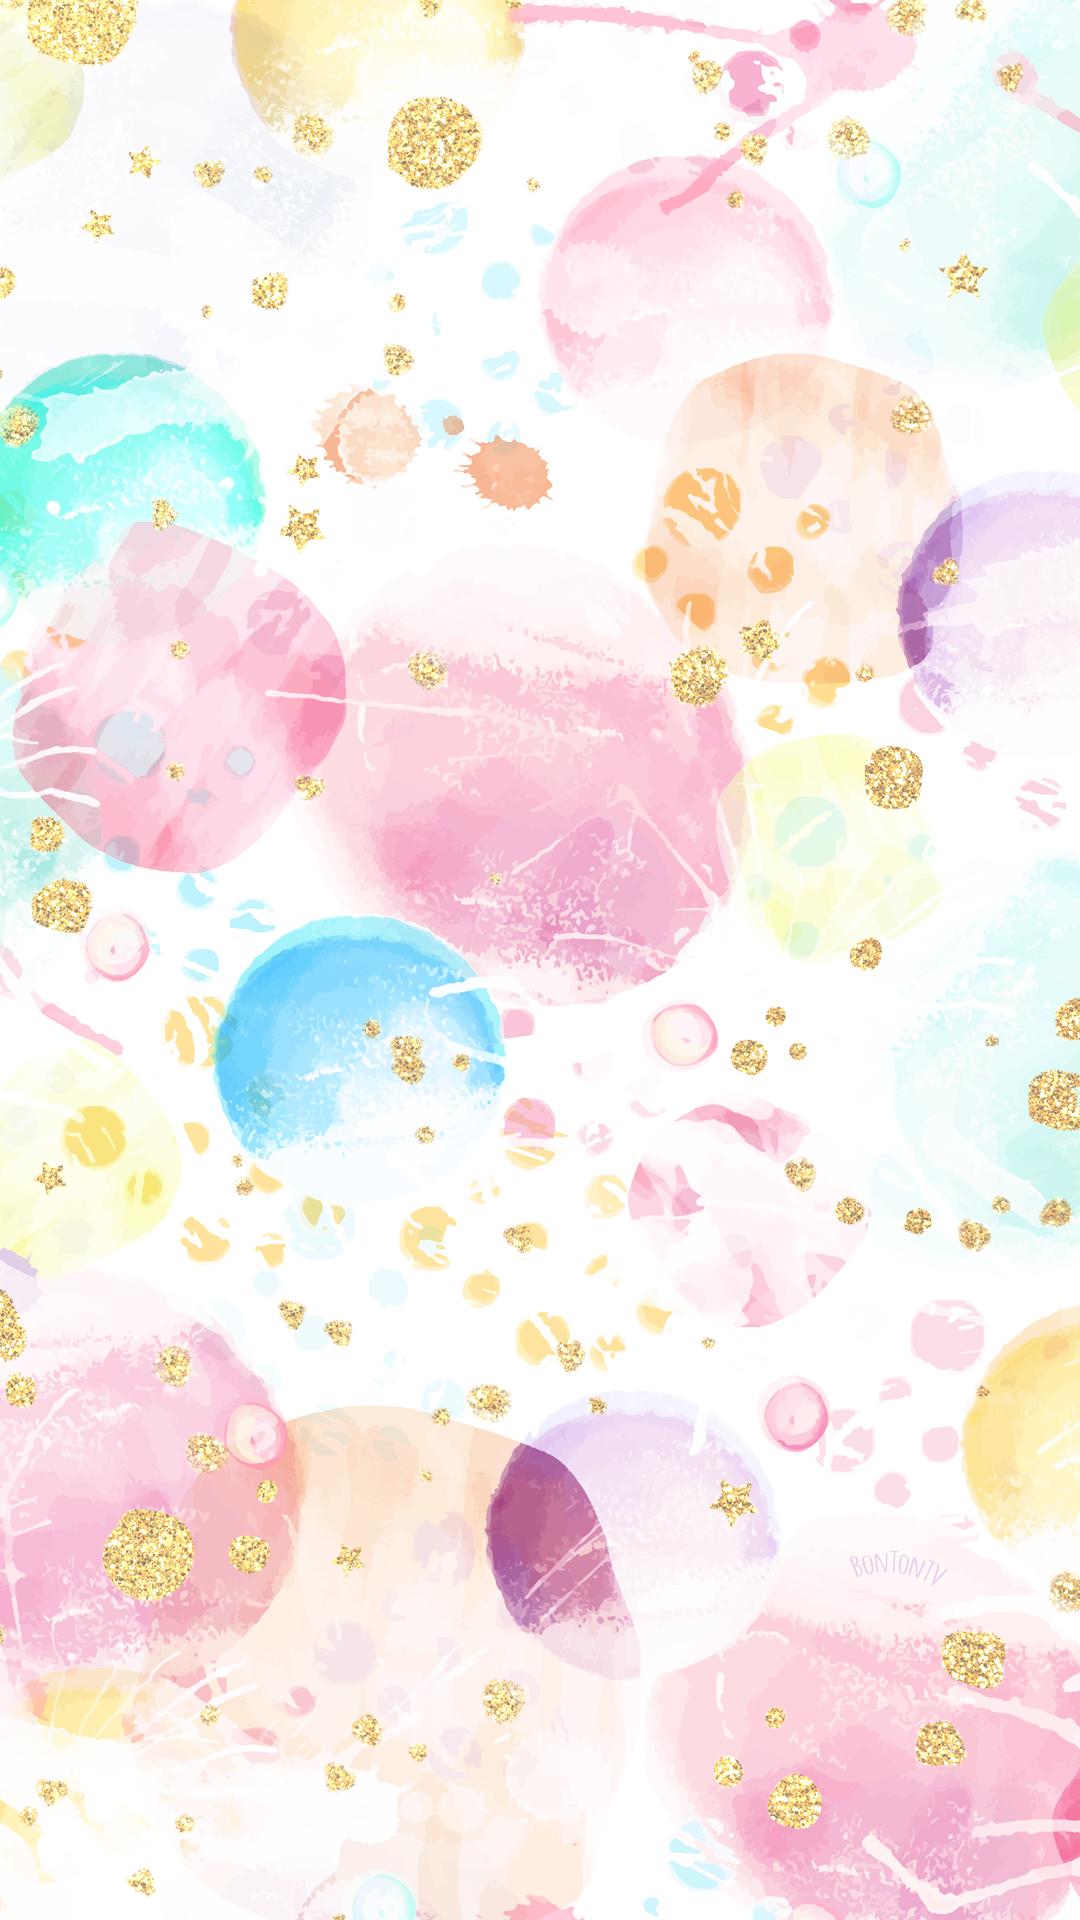 Download Latest Floral Phone Wallpaper HD 2020 by bontontv.com